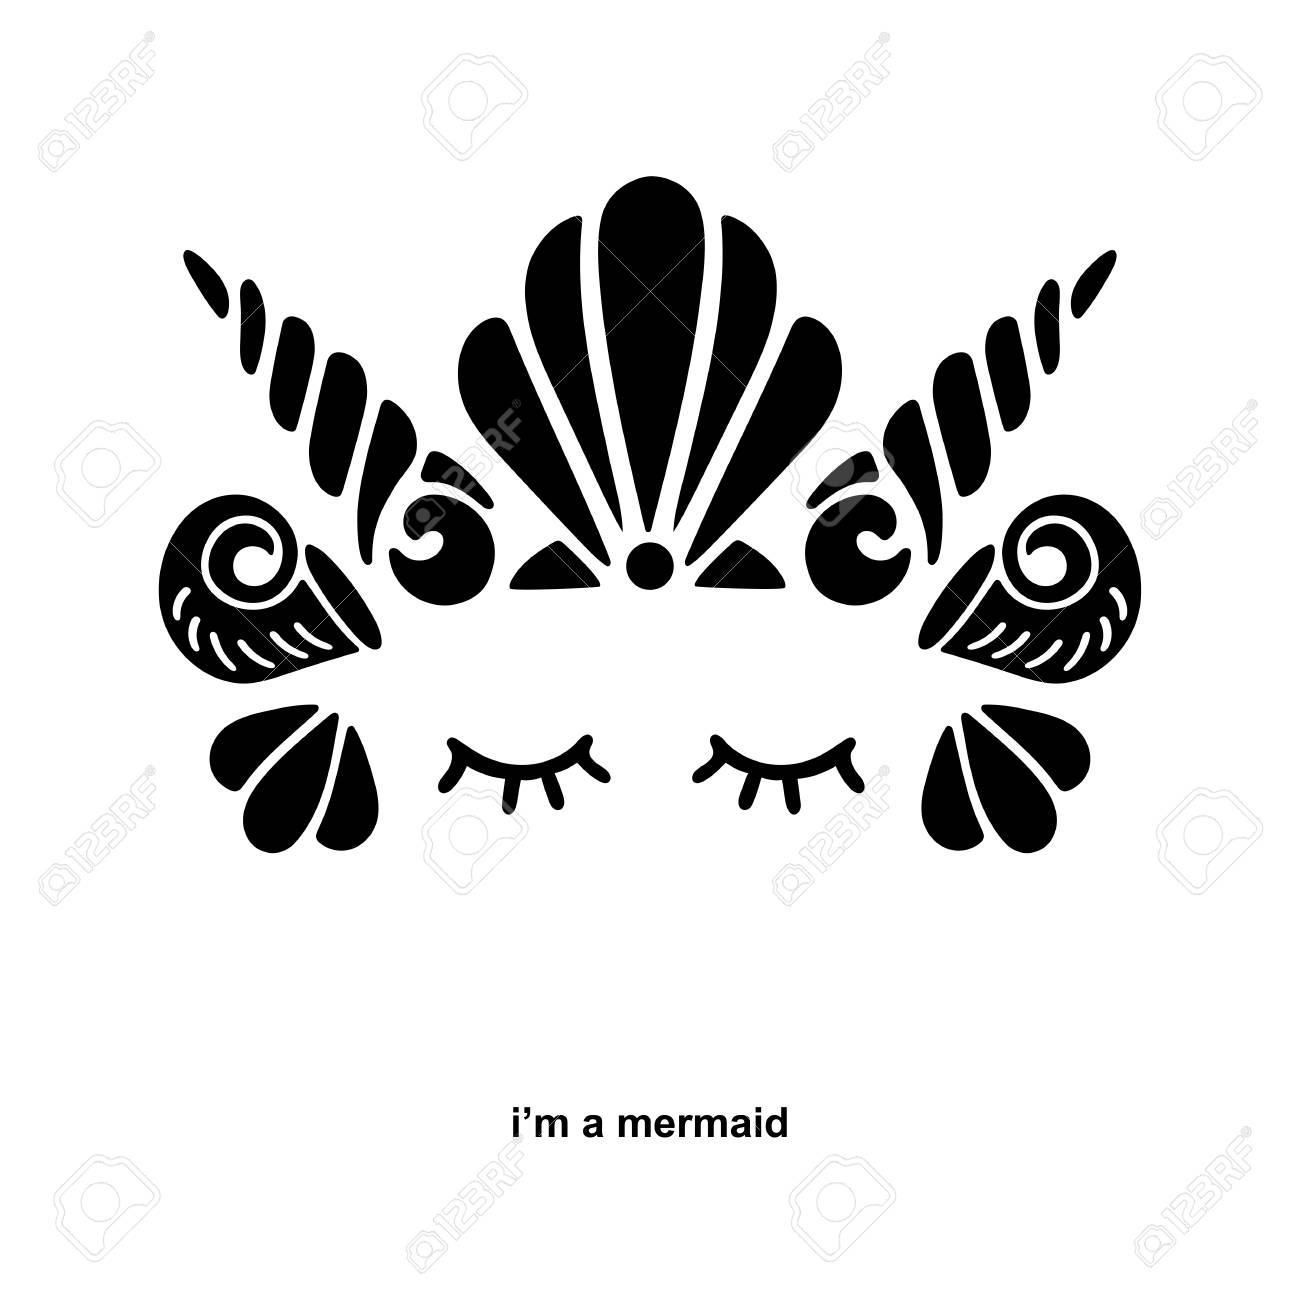 cute template with mermaid logo vector illustration mermaid